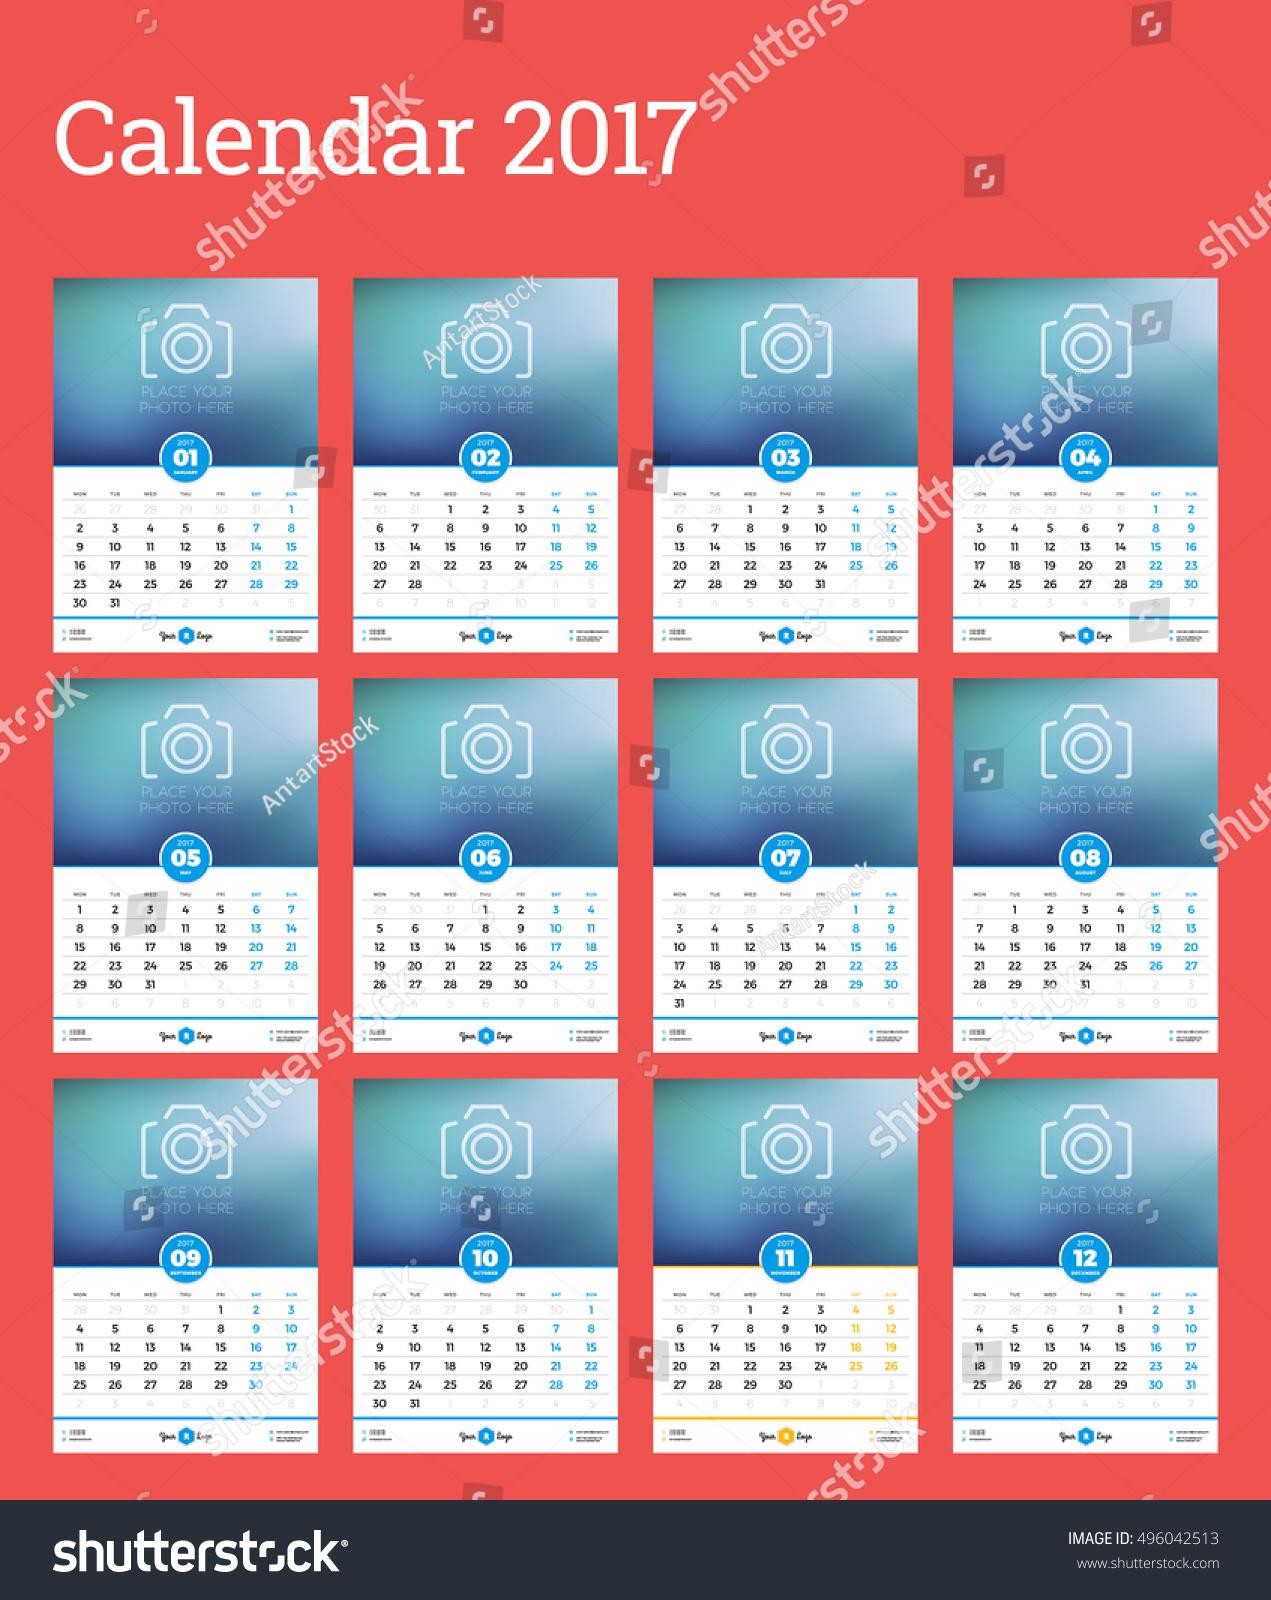 Calendar Poster Design : Wall calendar template year stock vector